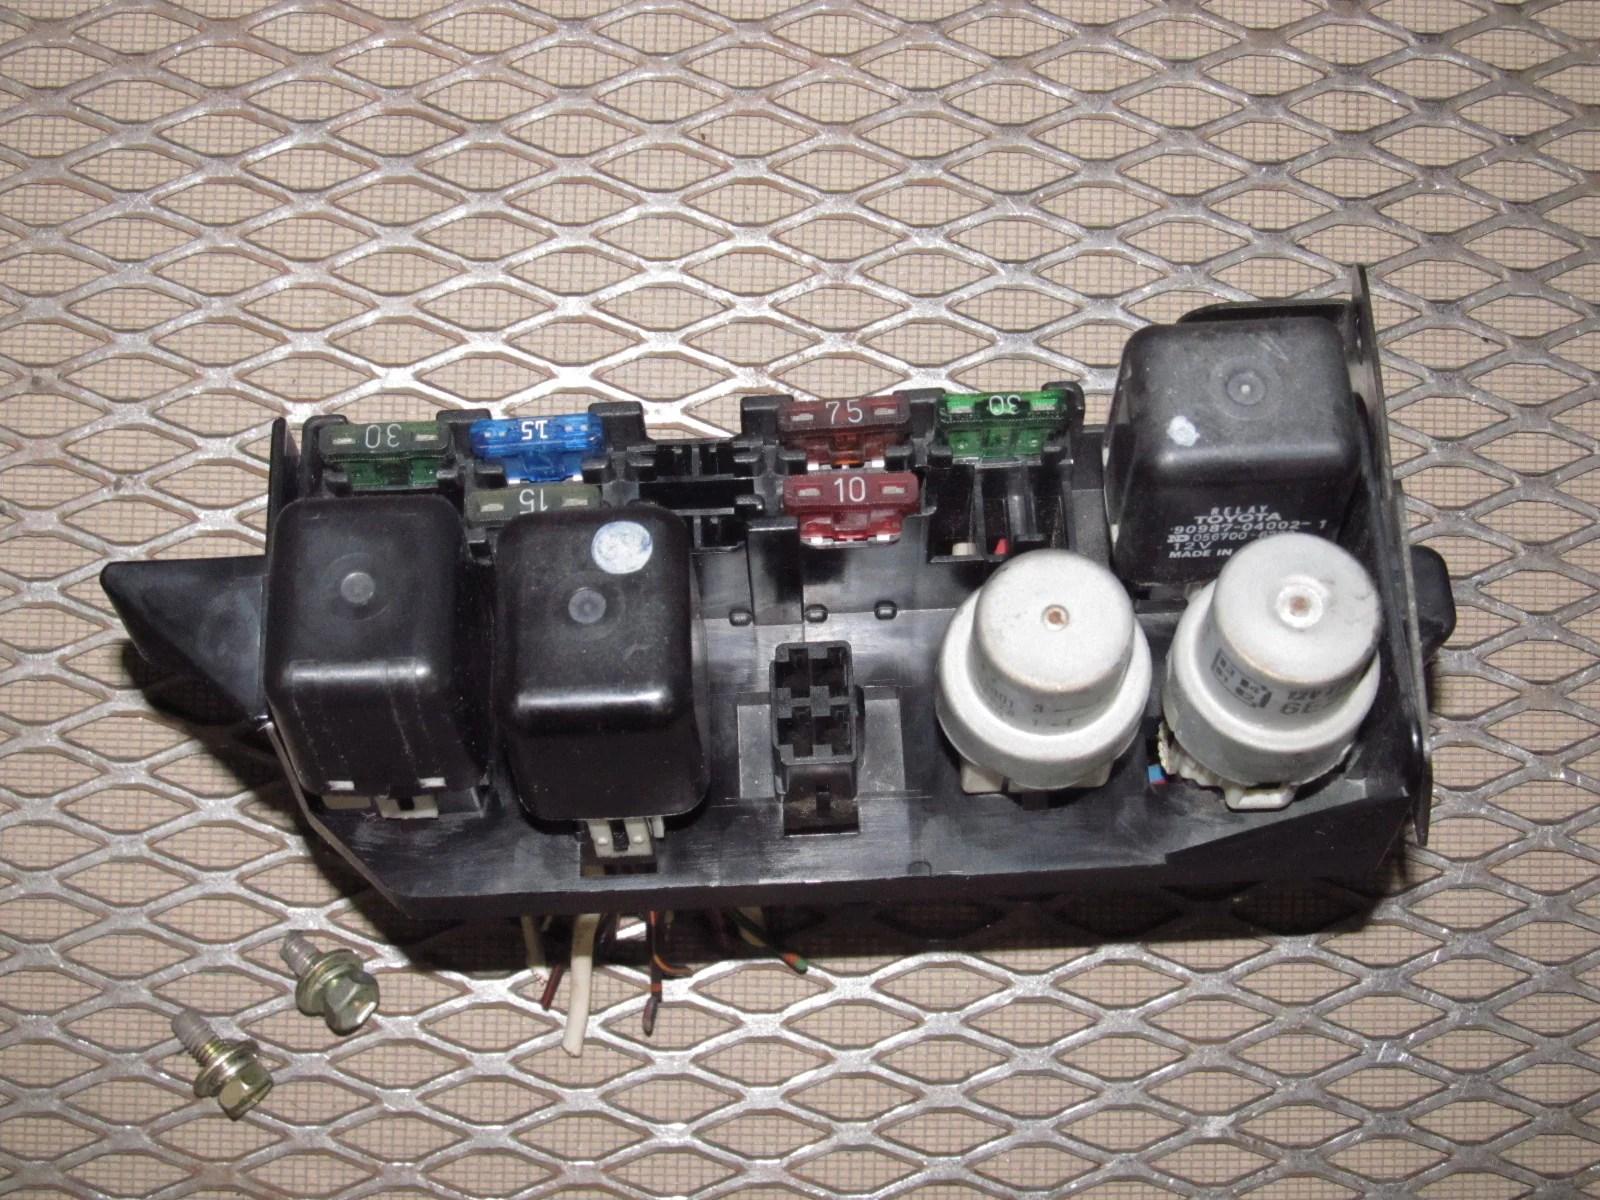 medium resolution of toyota mr2 mk1 fuse box wiring diagram centremr2 fuse box wiring diagram g985 mr2 fuse box